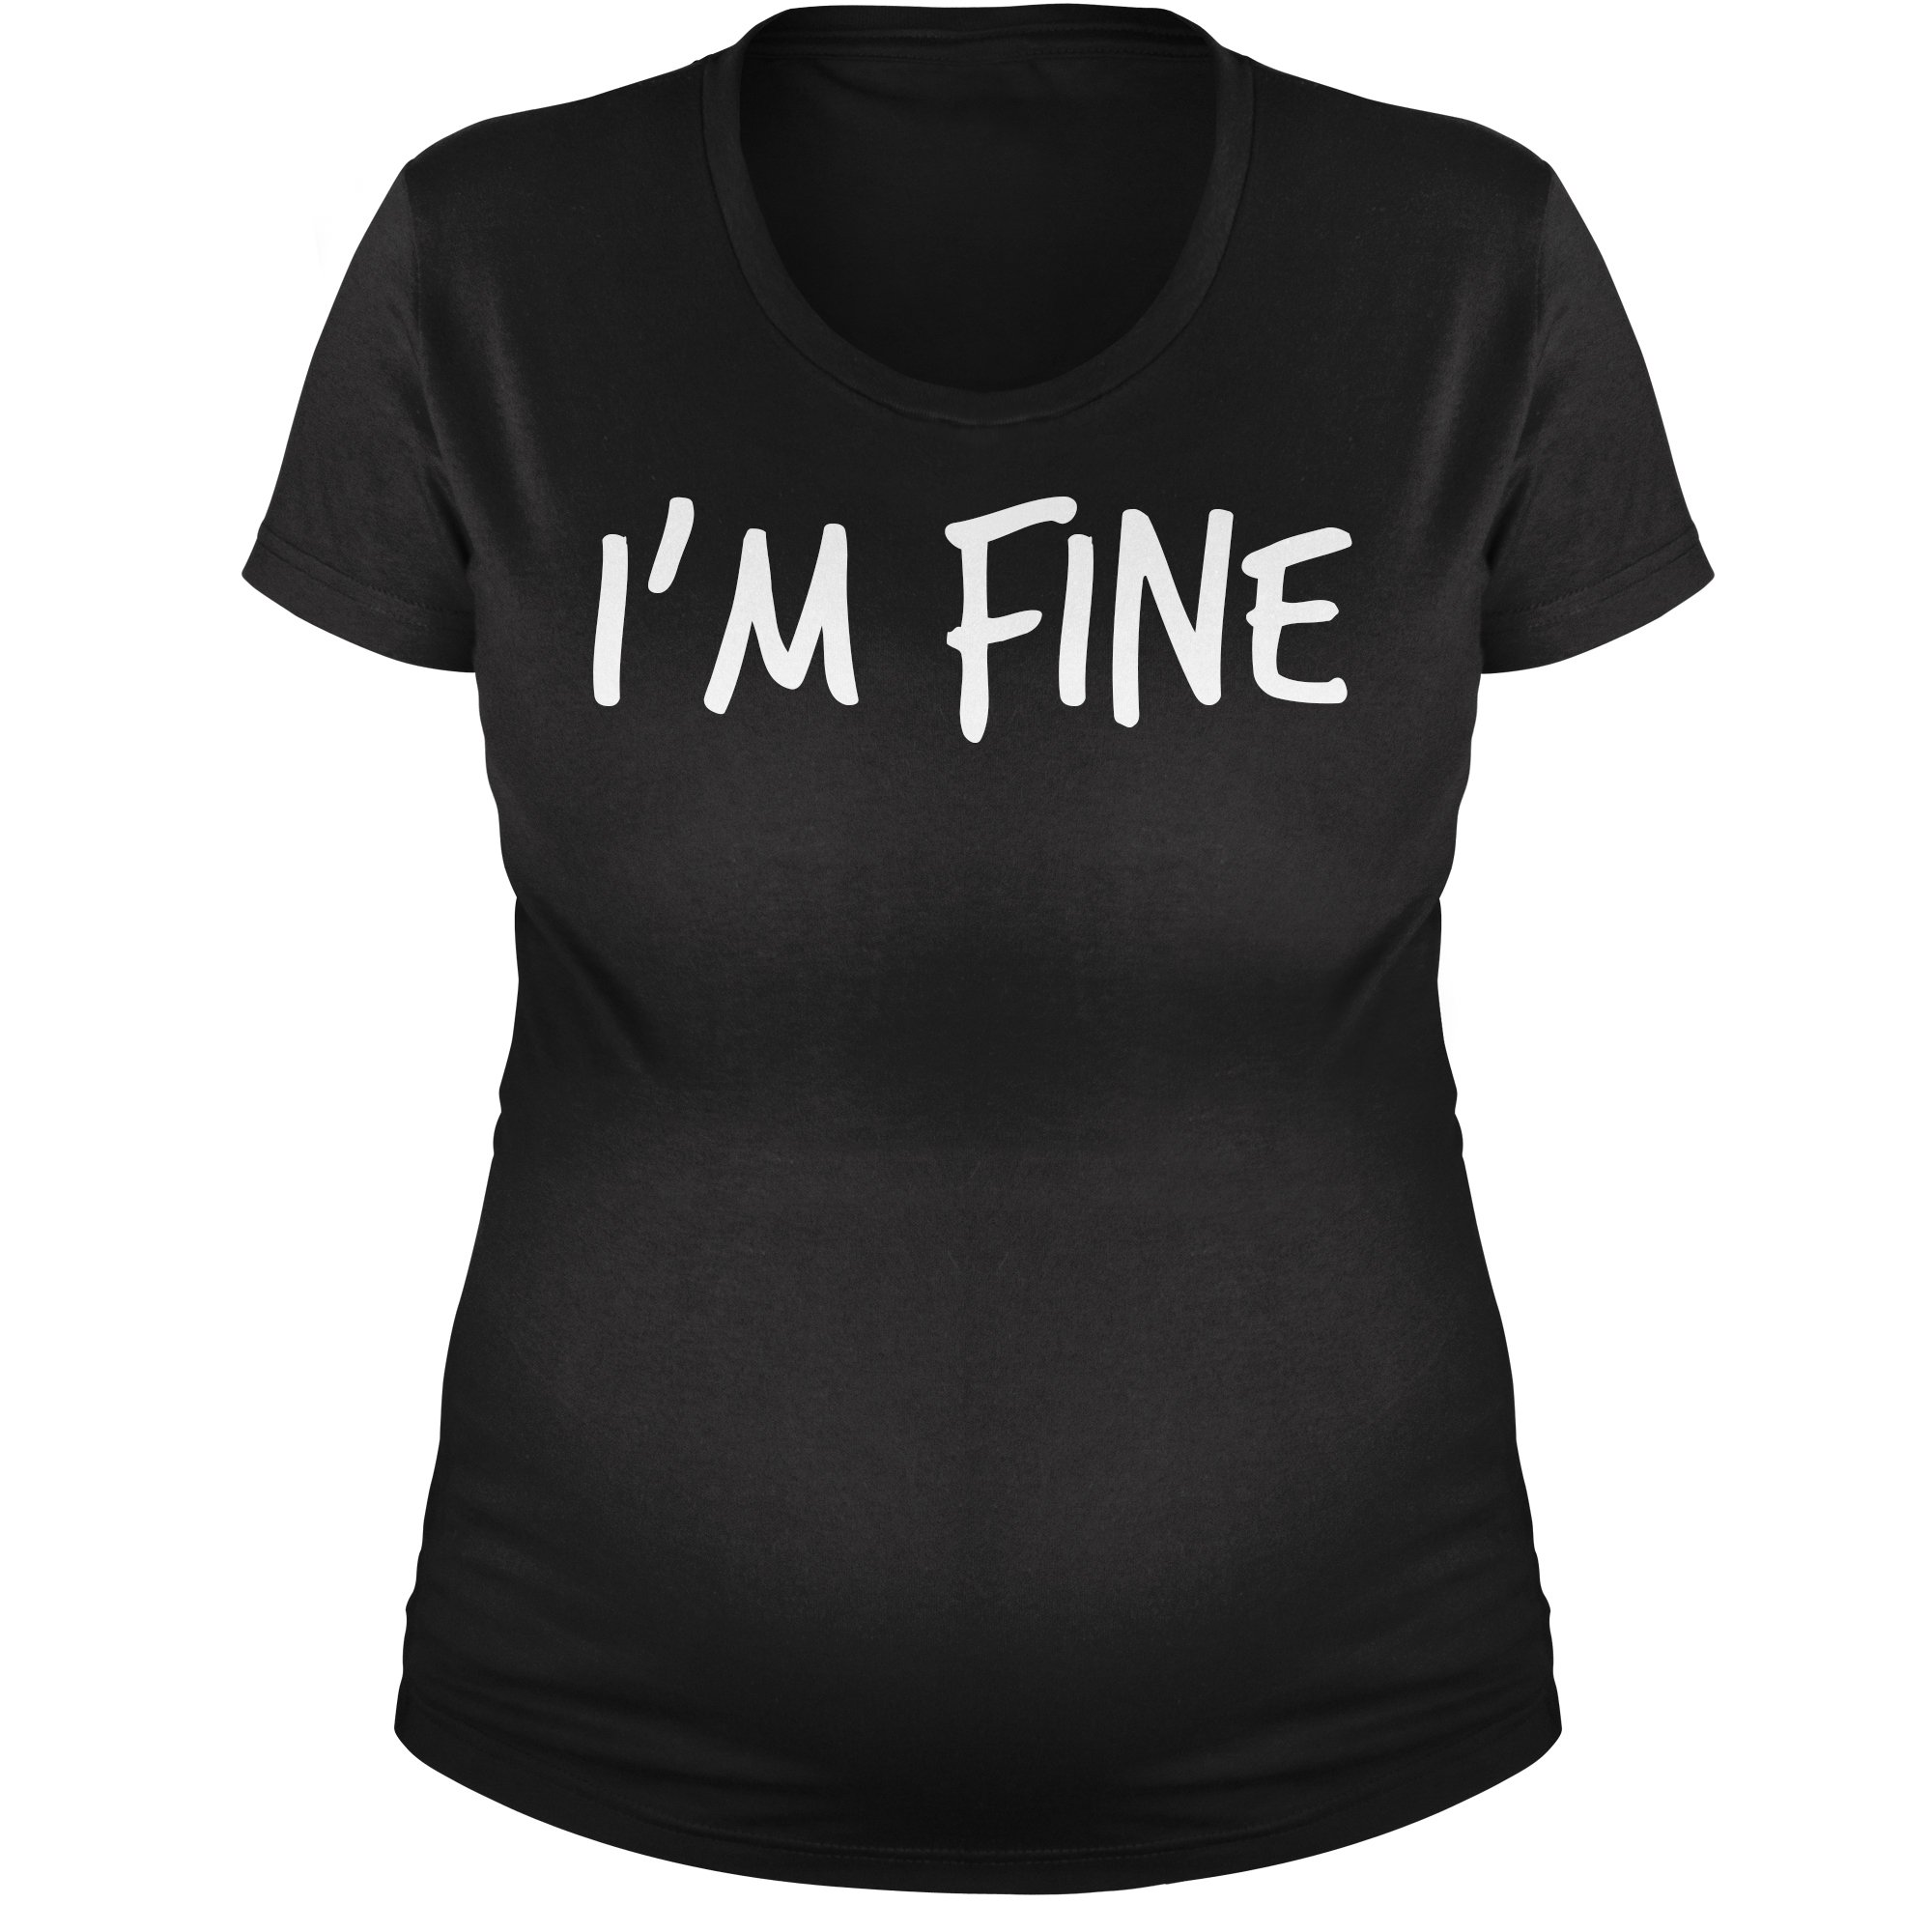 Expression Tees Maternity I'm Fine T-Shirt 3XL Black